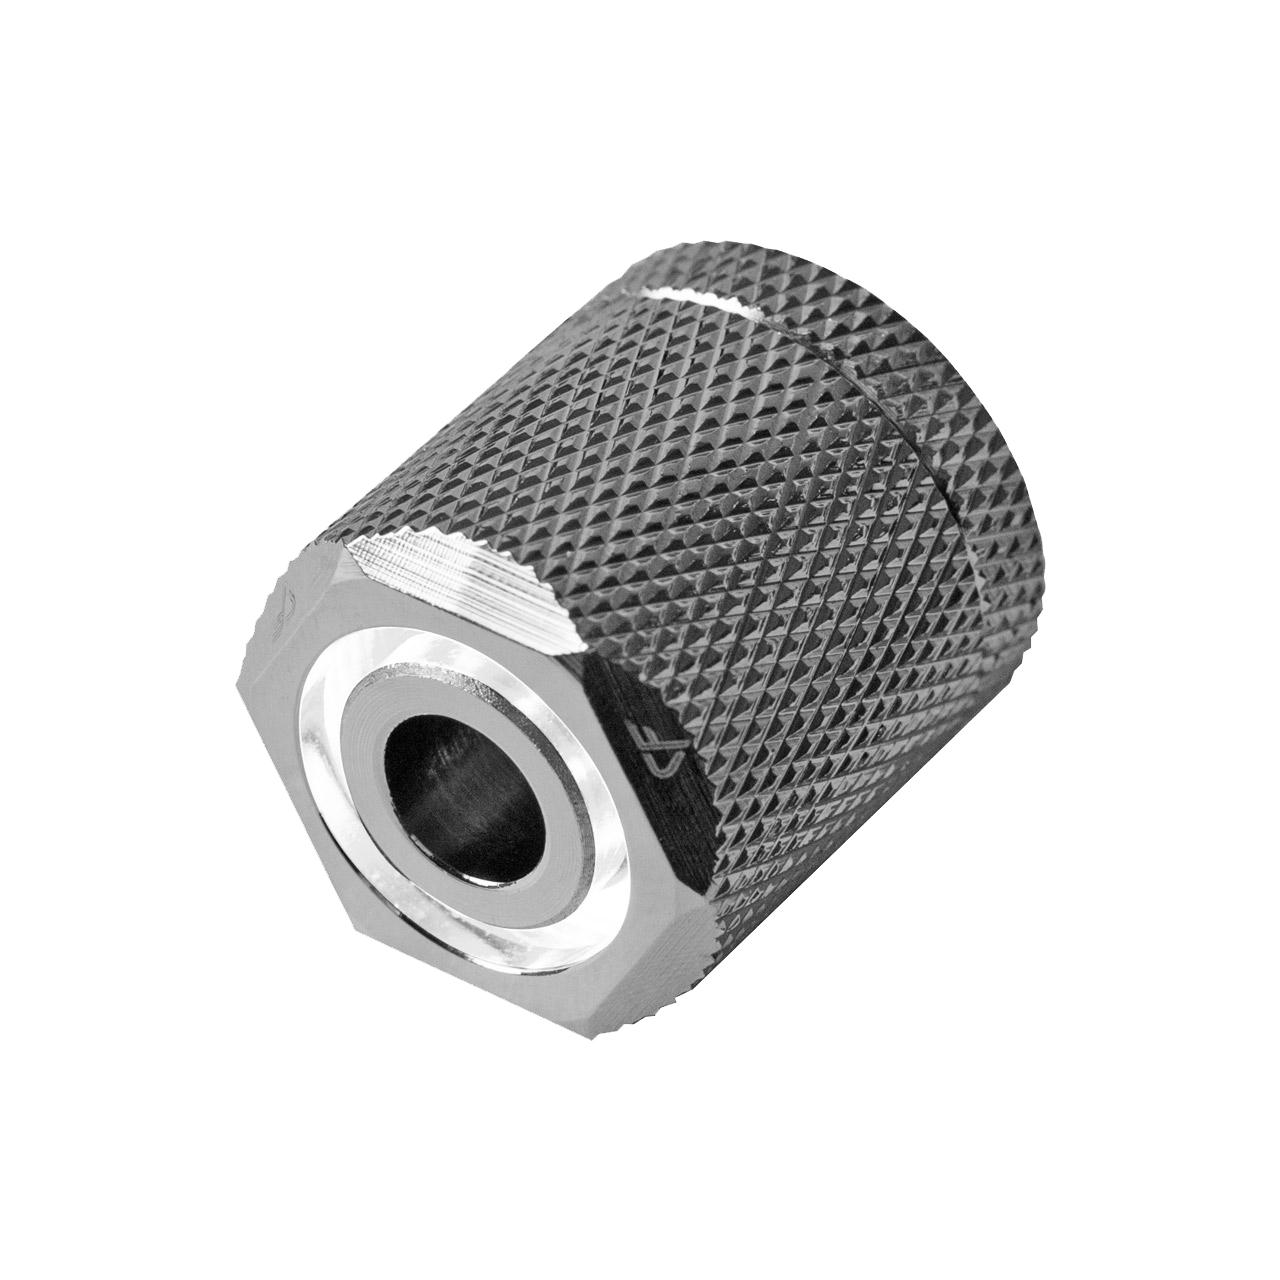 Nanoxia CoolForce LED Fitting 16/13 White Nickel Rosca Exterior LED para Tubos de Refrigeración